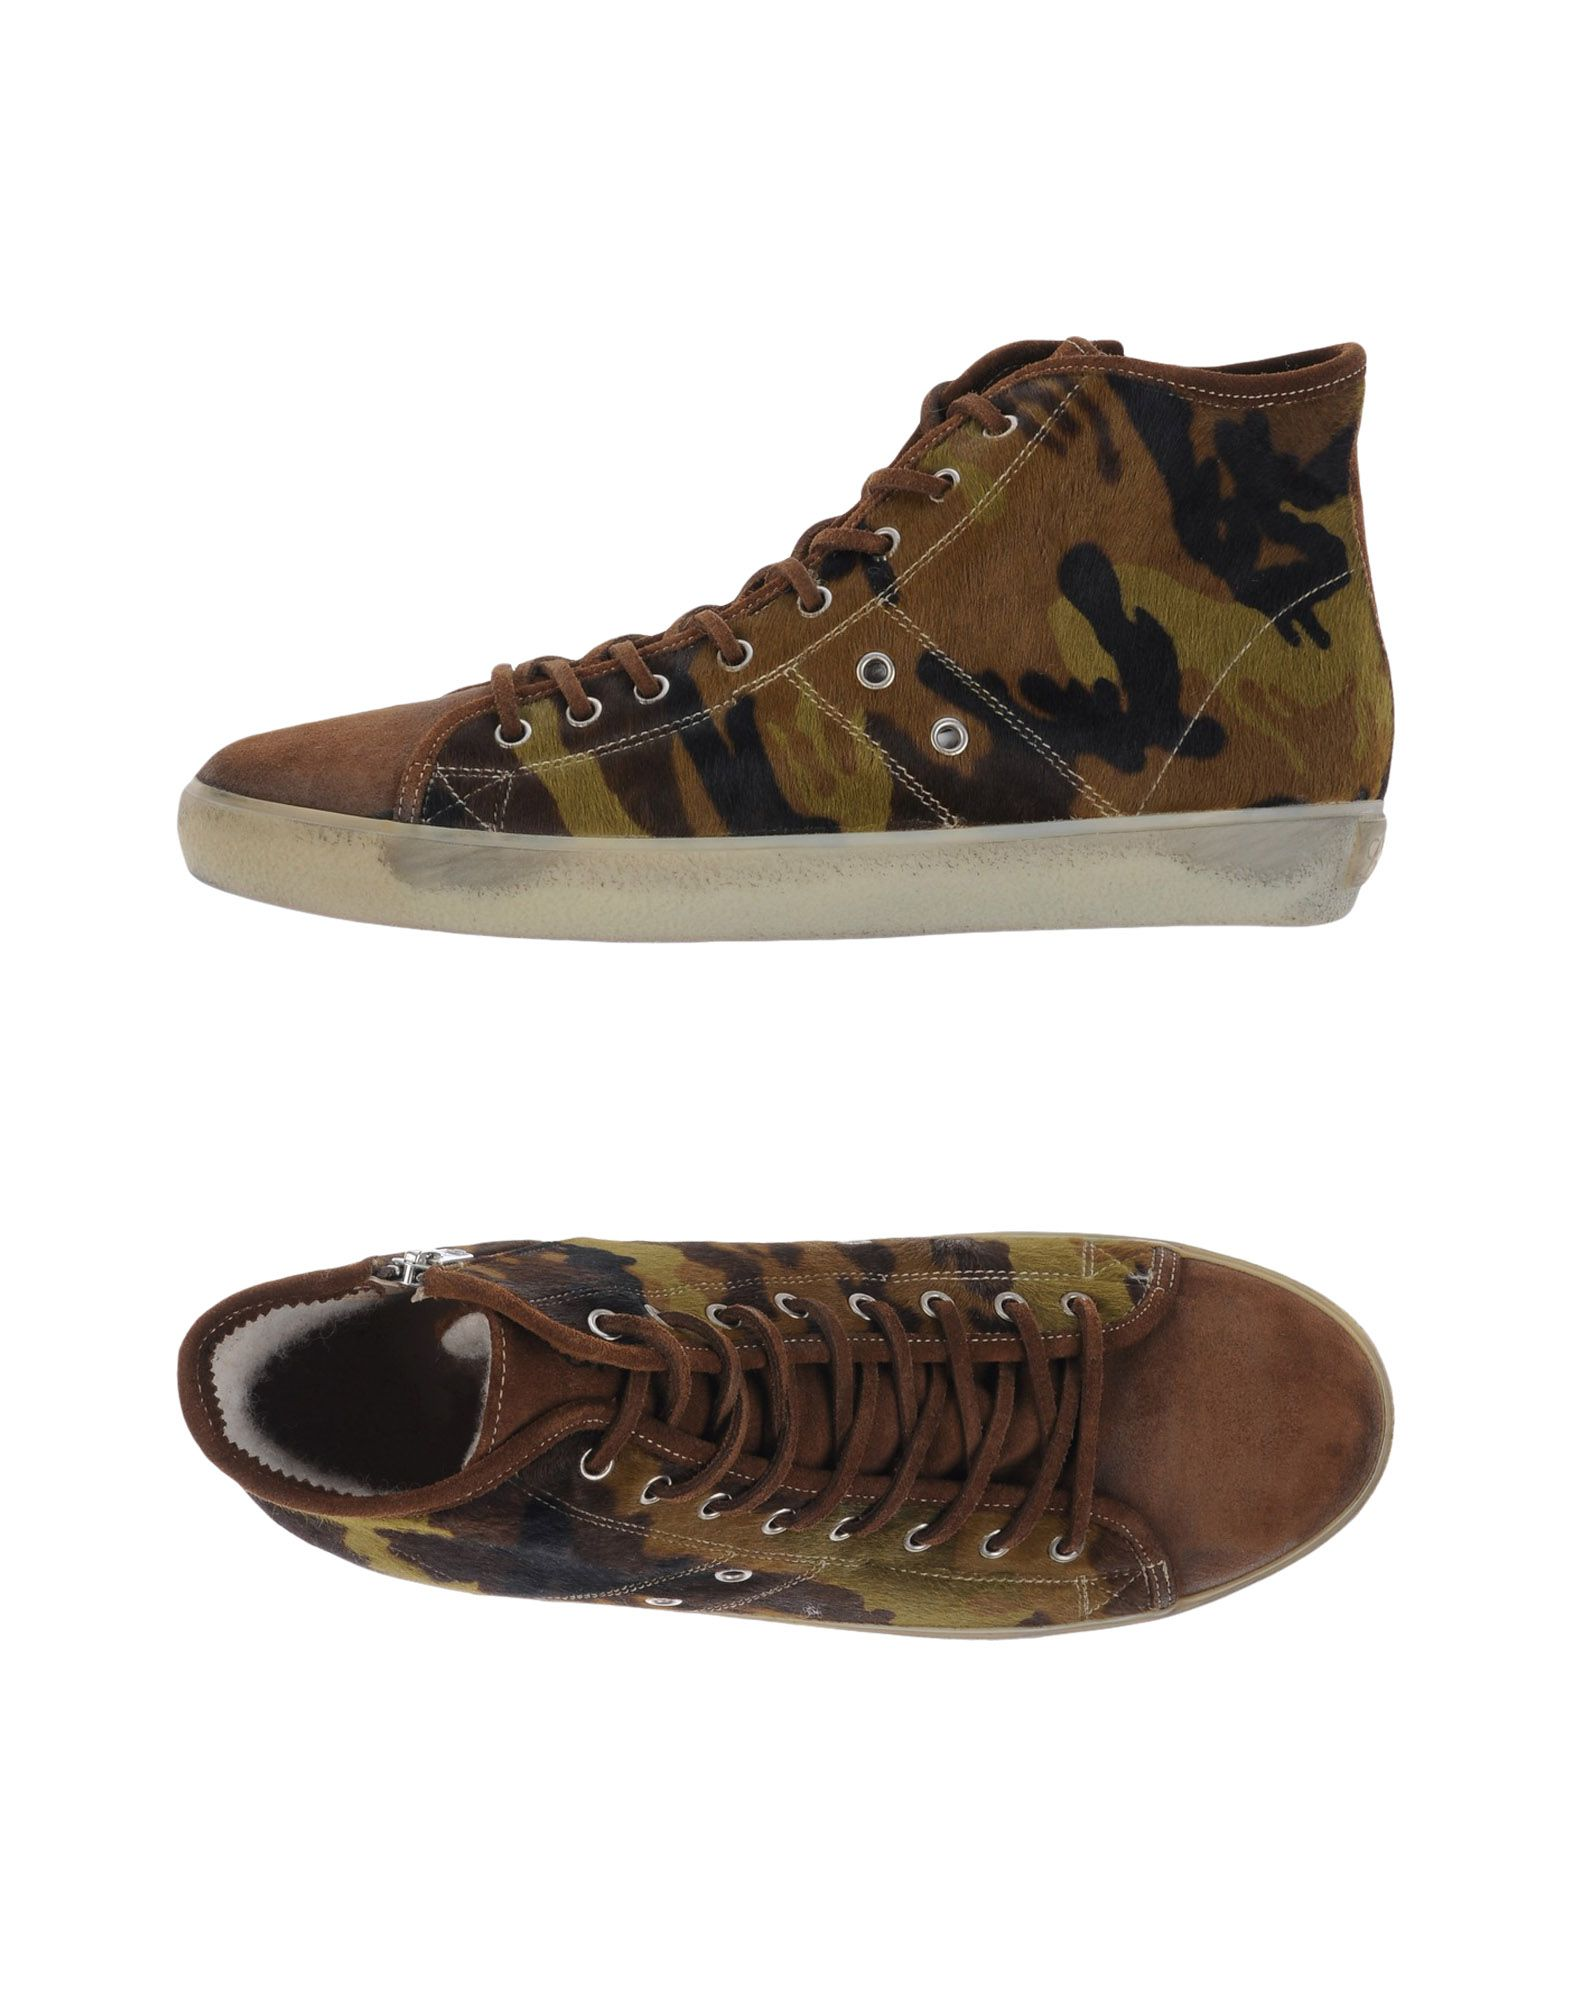 Leather Crown Sneakers 11191725NT Herren  11191725NT Sneakers Neue Schuhe c5e527